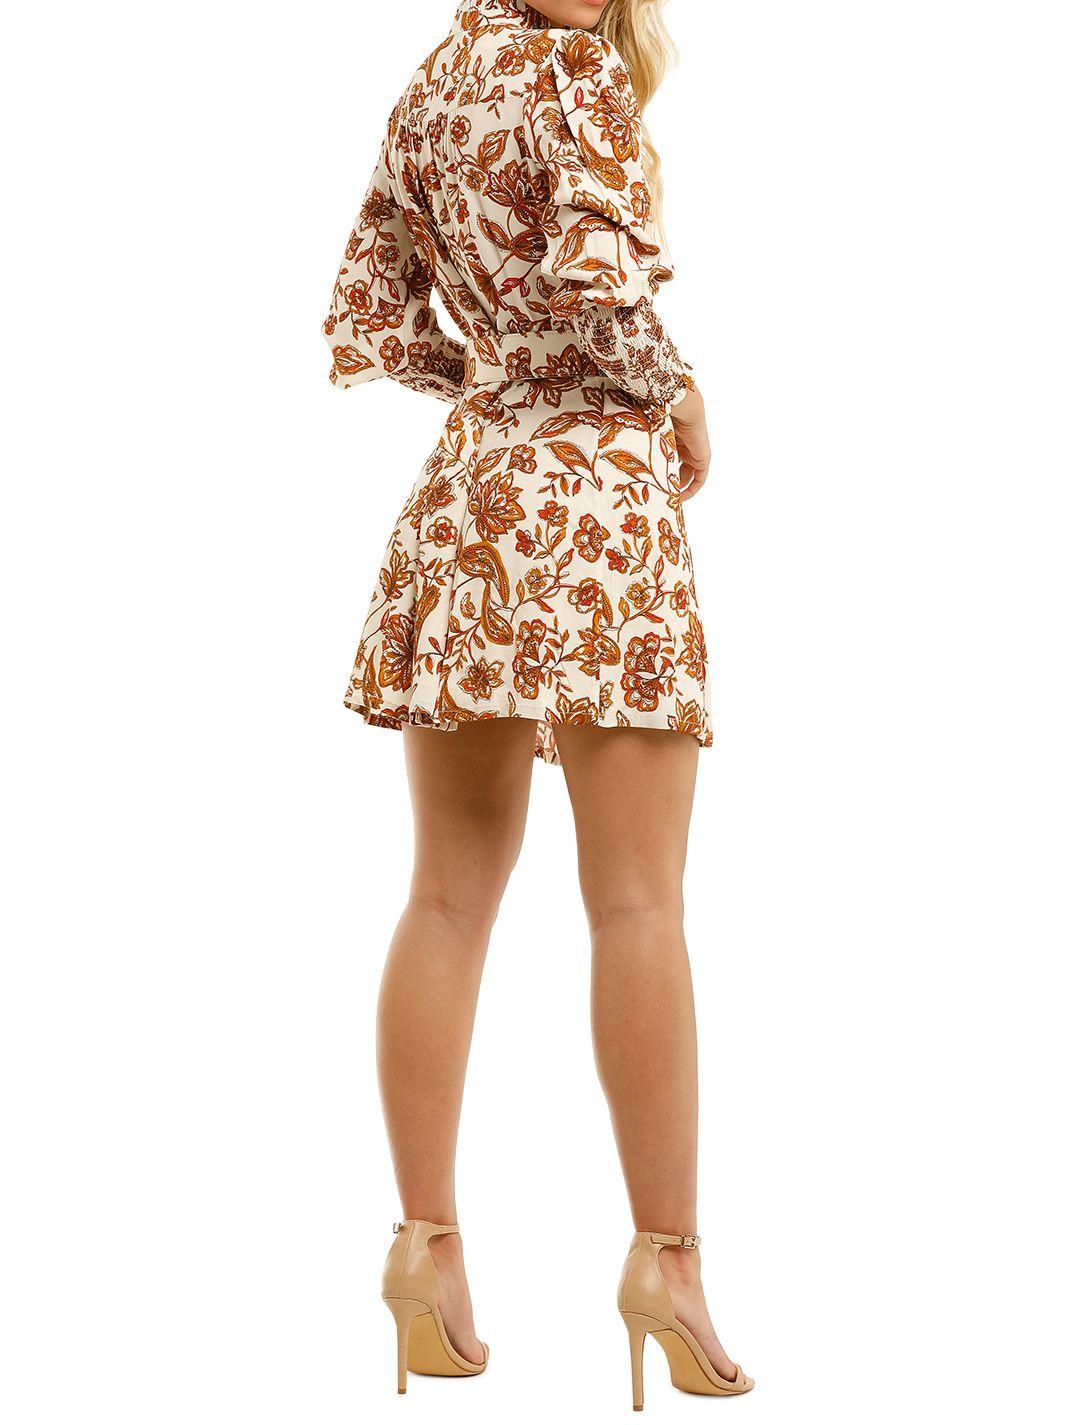 Nicholas-Agadir-Dress-Ivory-Paisley-Floral-Print-Back